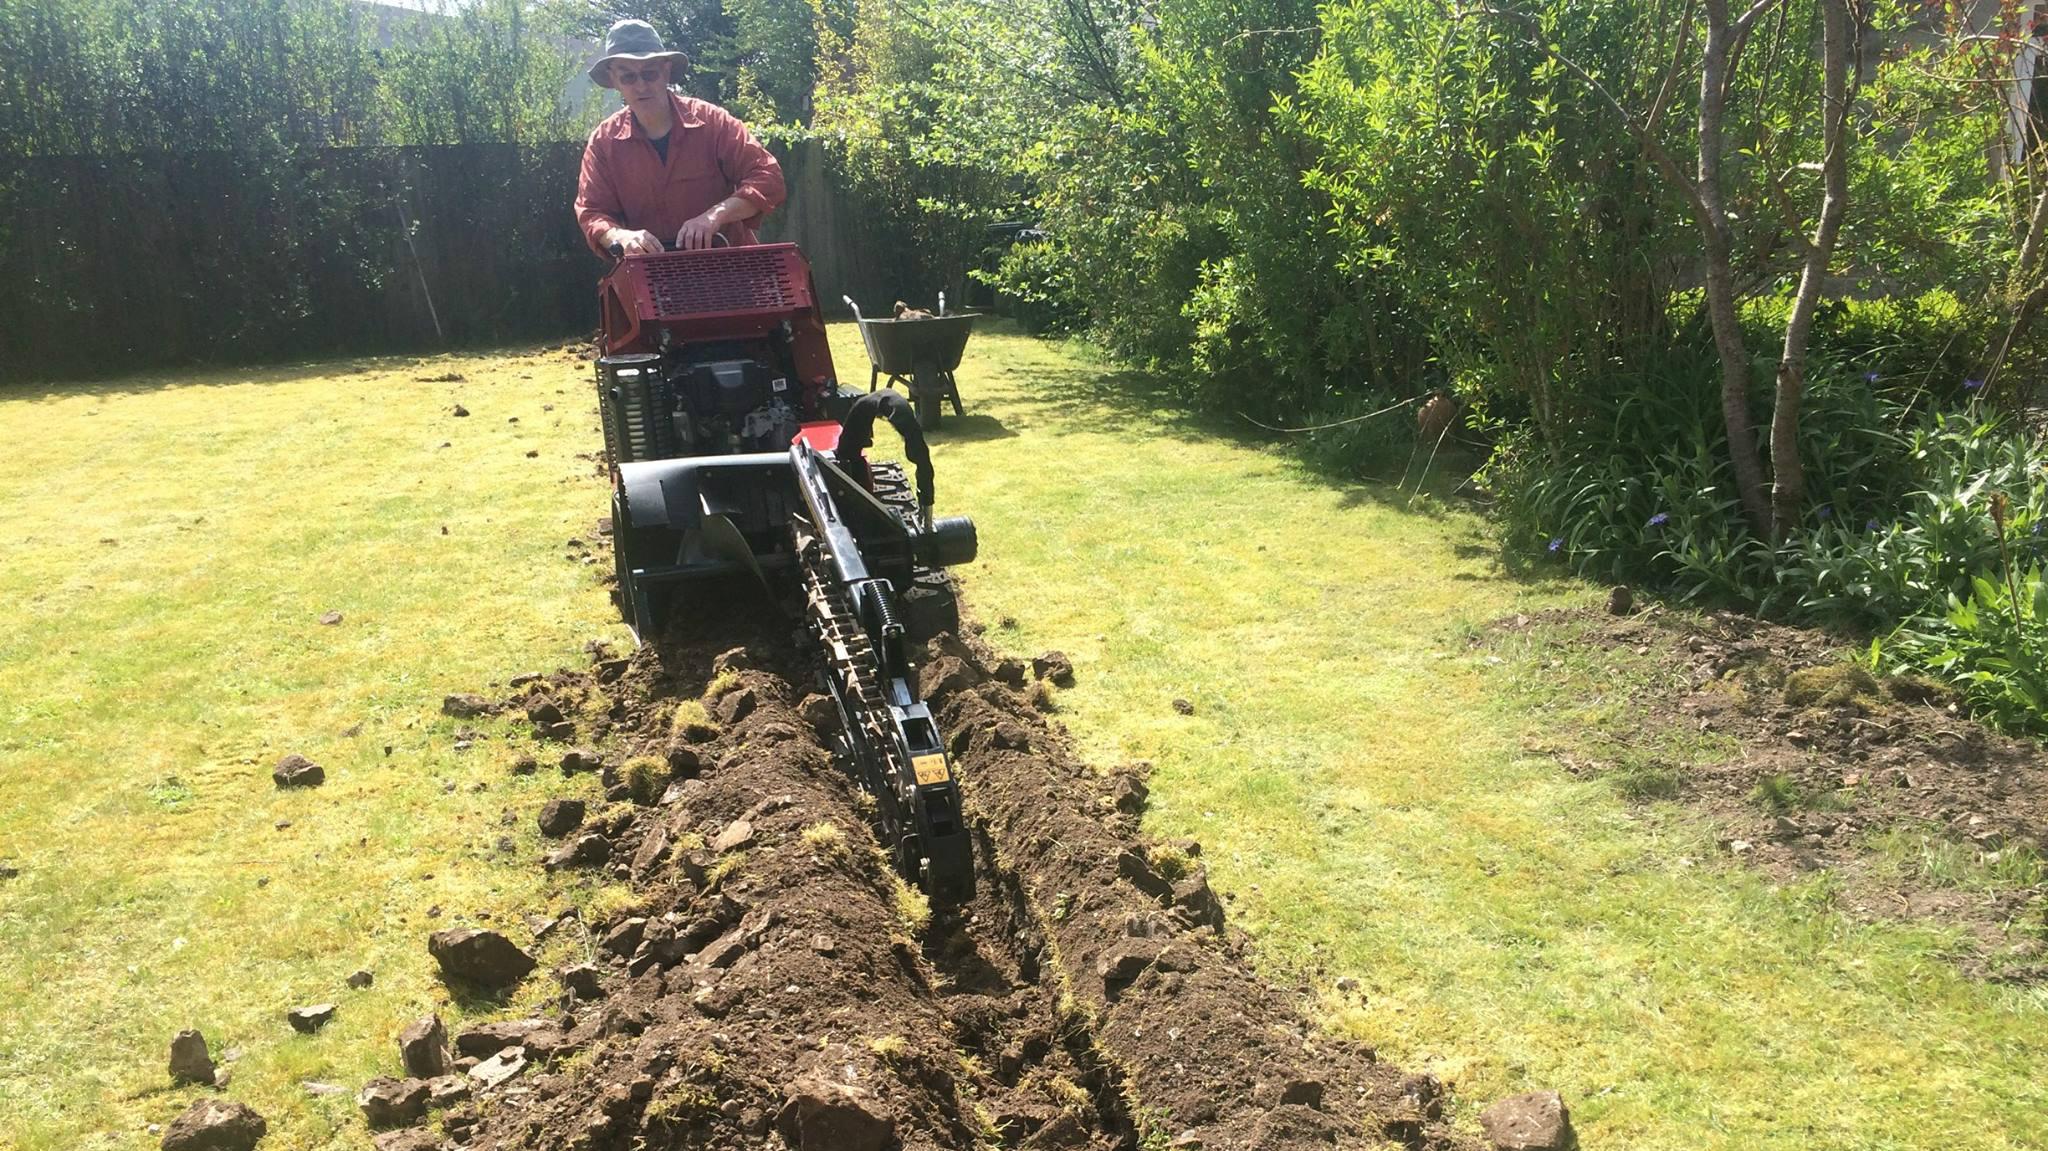 b4rn digging